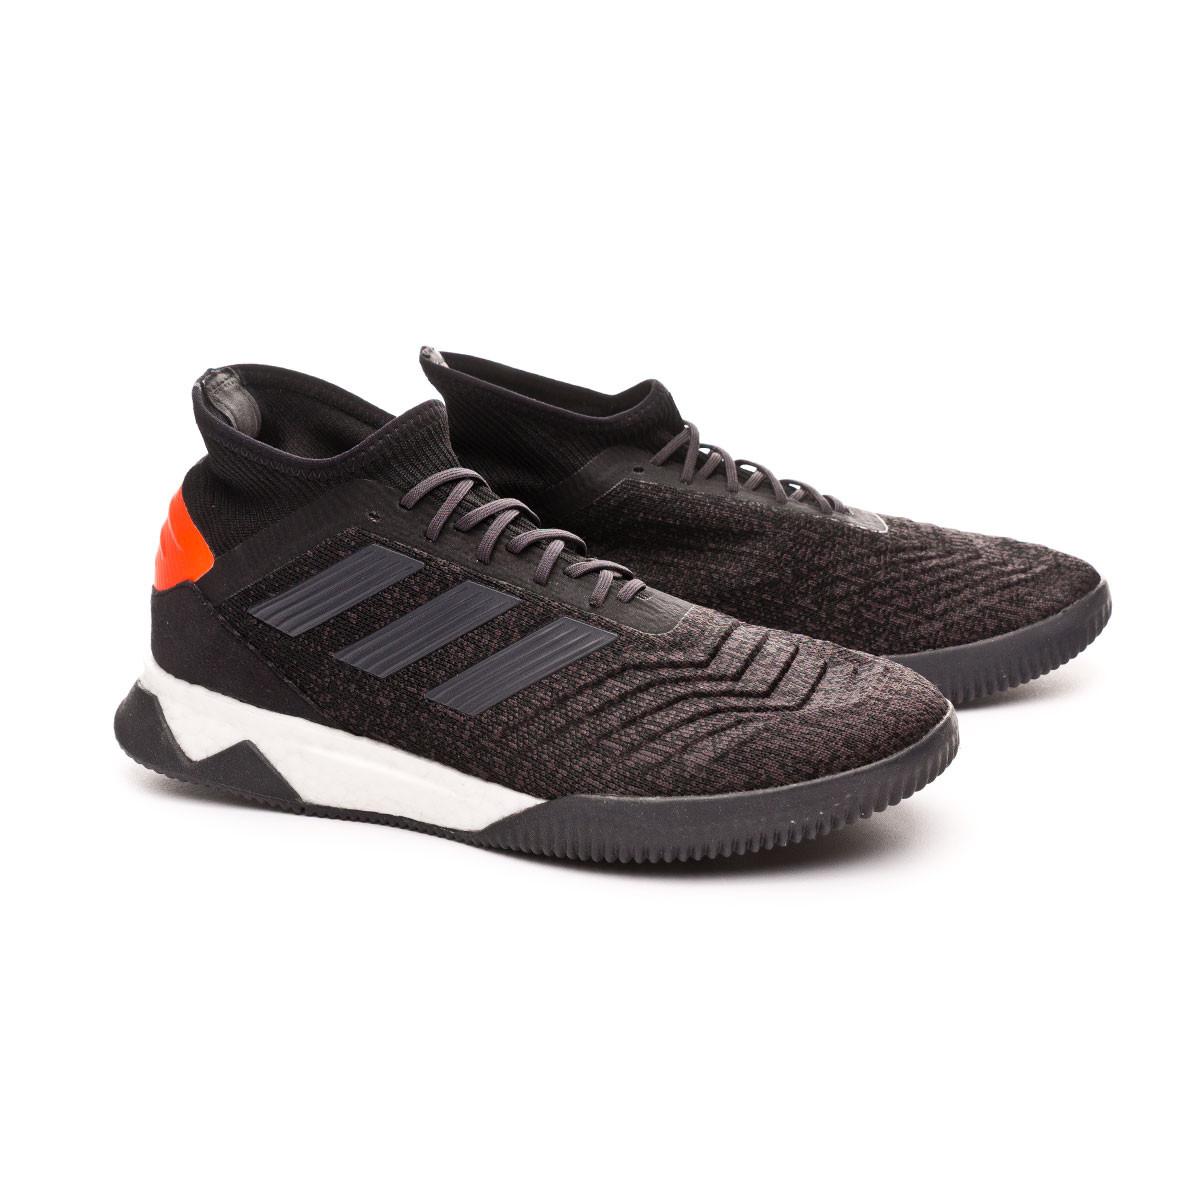 Baskets adidas Predator 19.1 TR